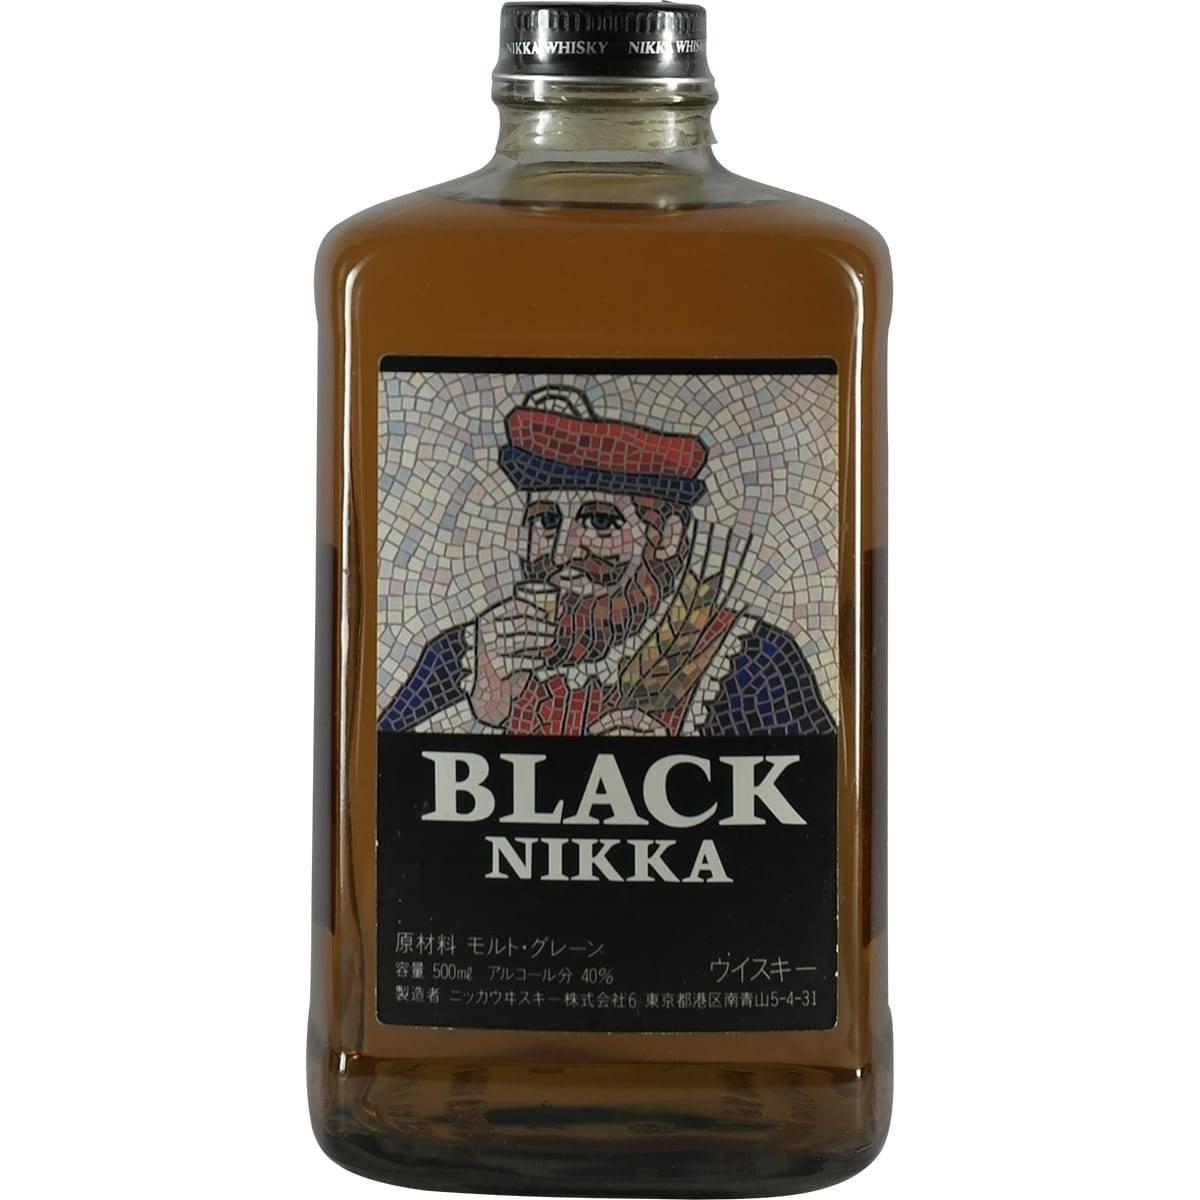 Виски «nikka» black 8 years old, 0.7 л — «никка» блэк 8-летний, 700 мл